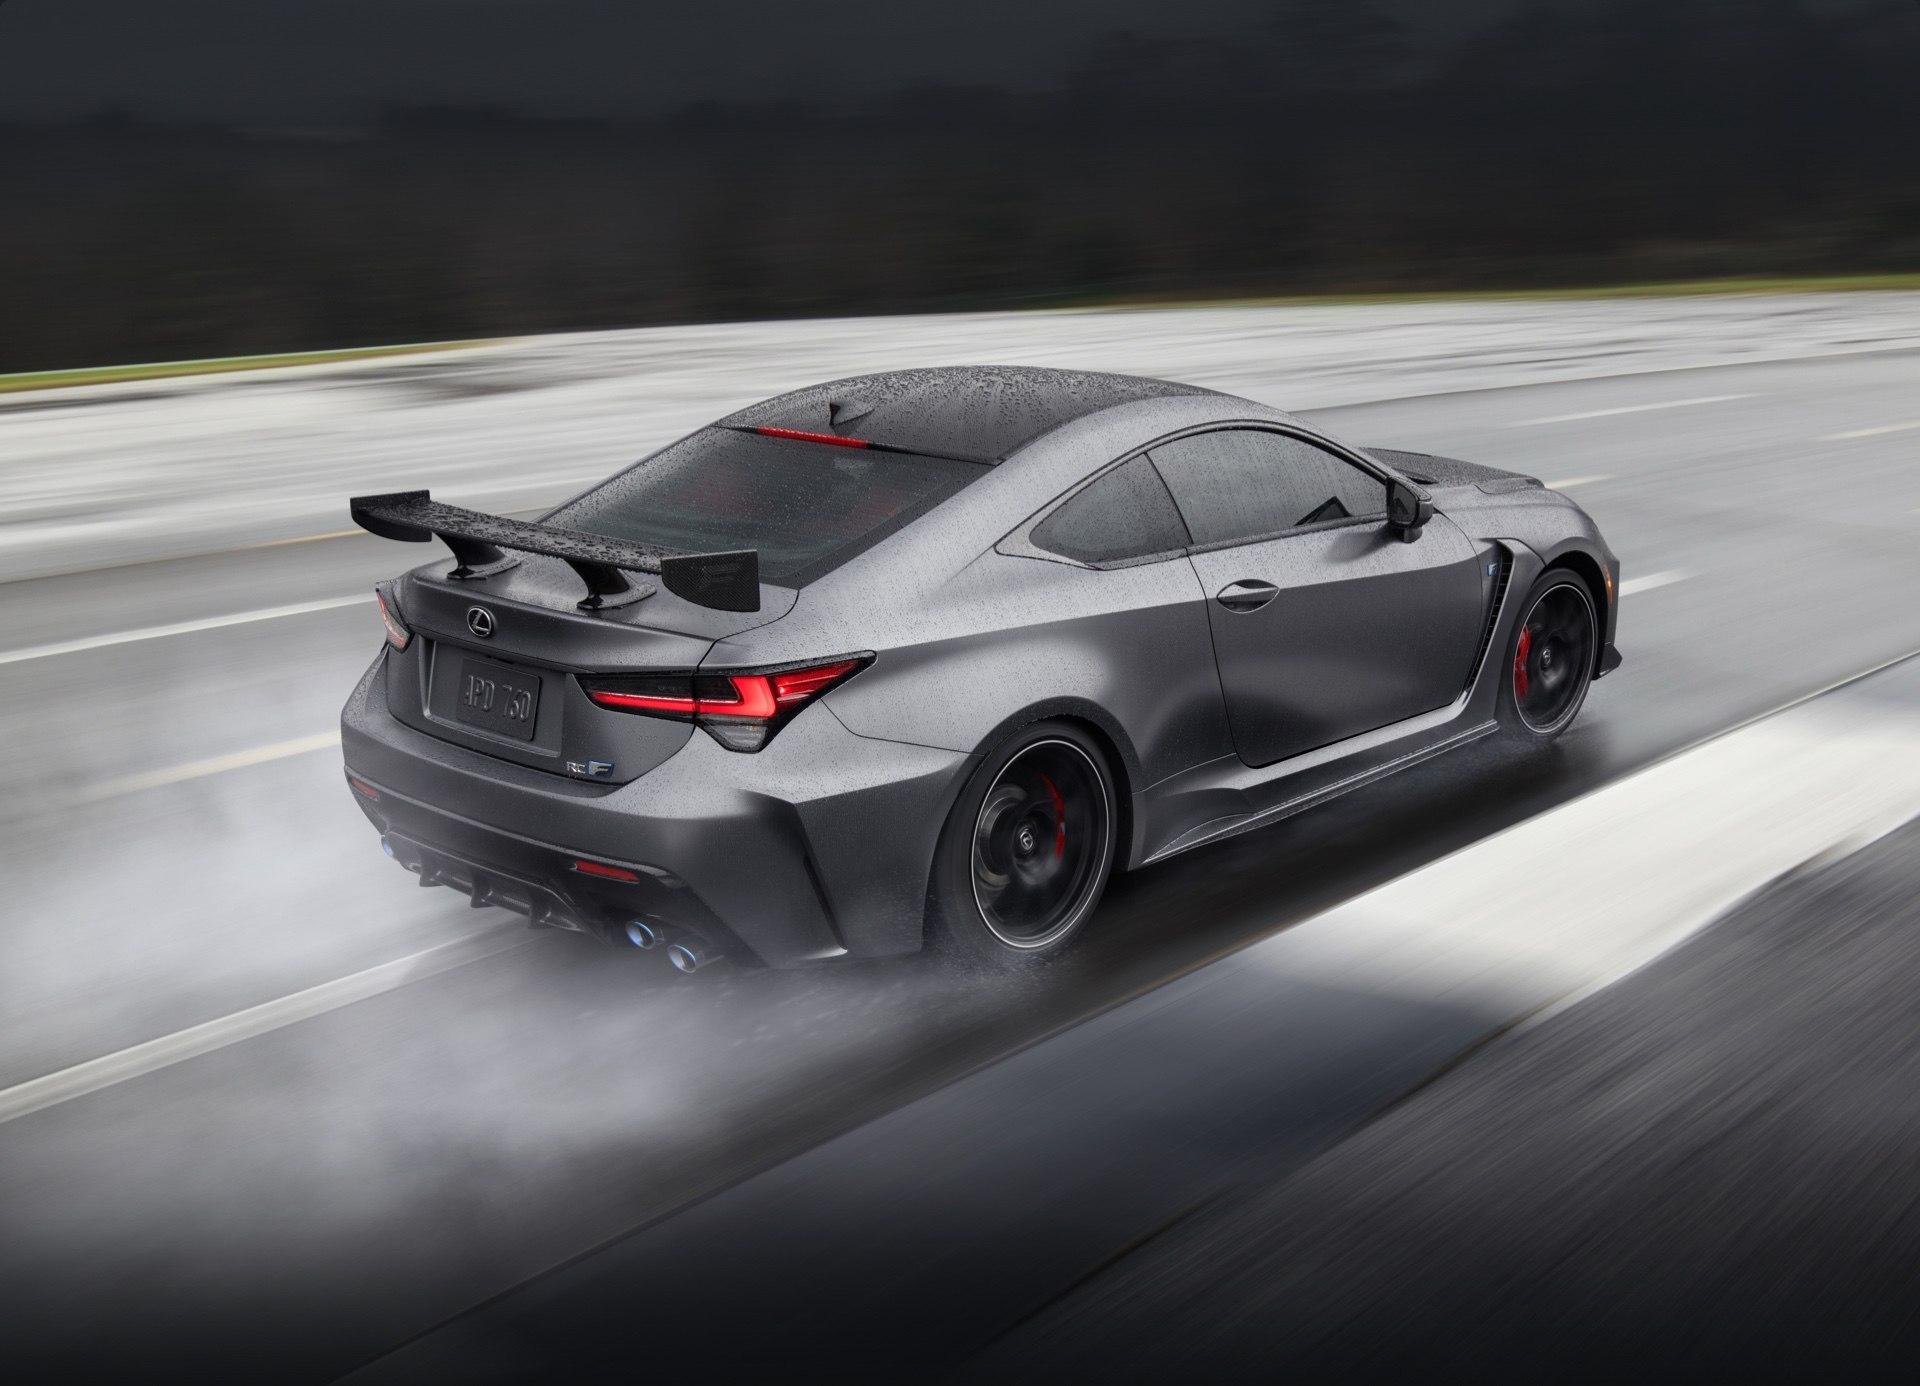 lexus-performance-2020-rcf-matte-nebula-grey-track-inspired-race-ready-x